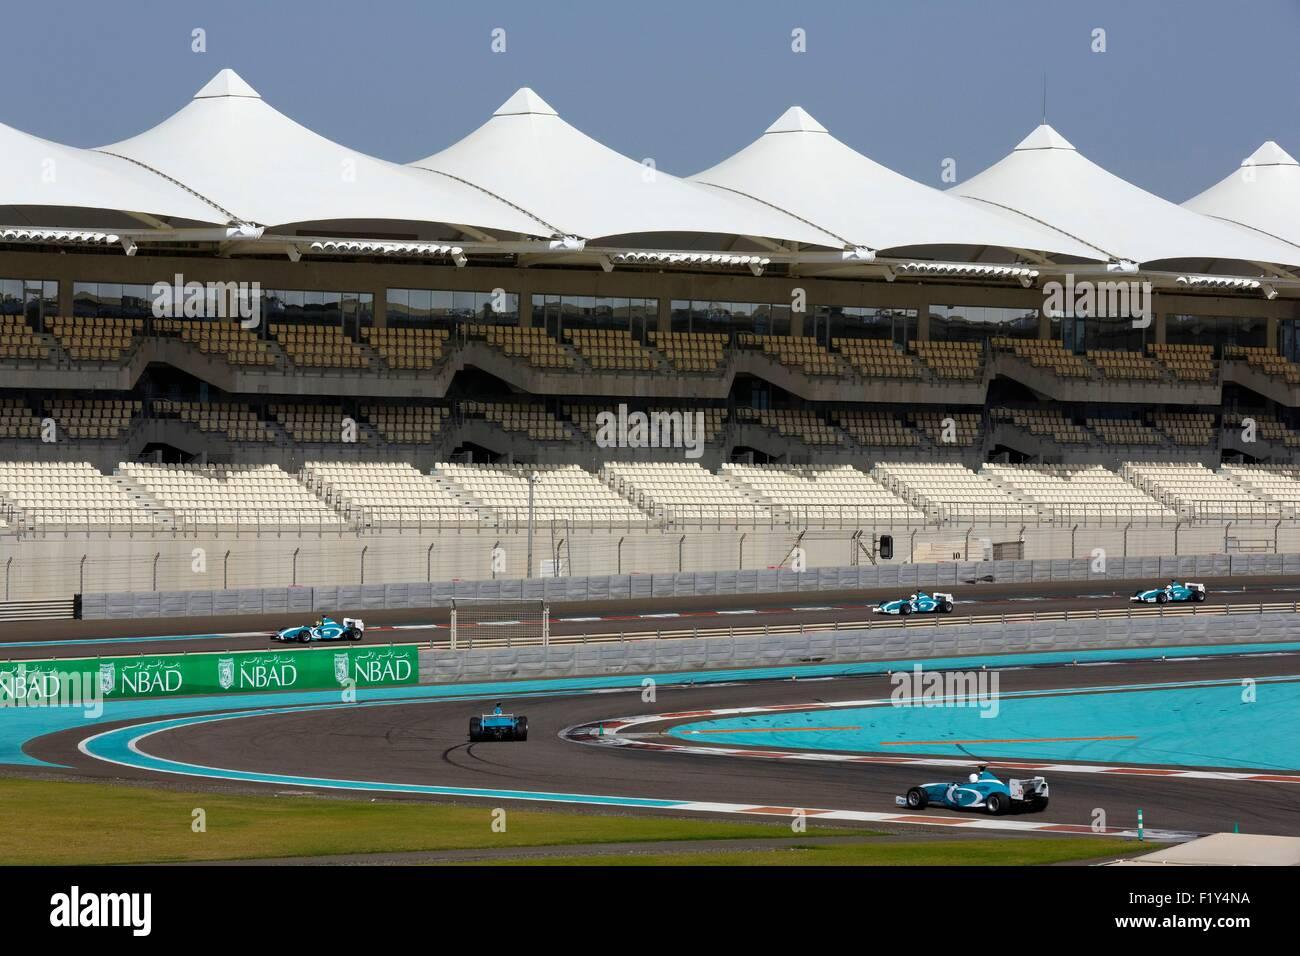 Circuito Yas Marina : Los emiratos Árabes unidos abu dhabi el circuito yas marina